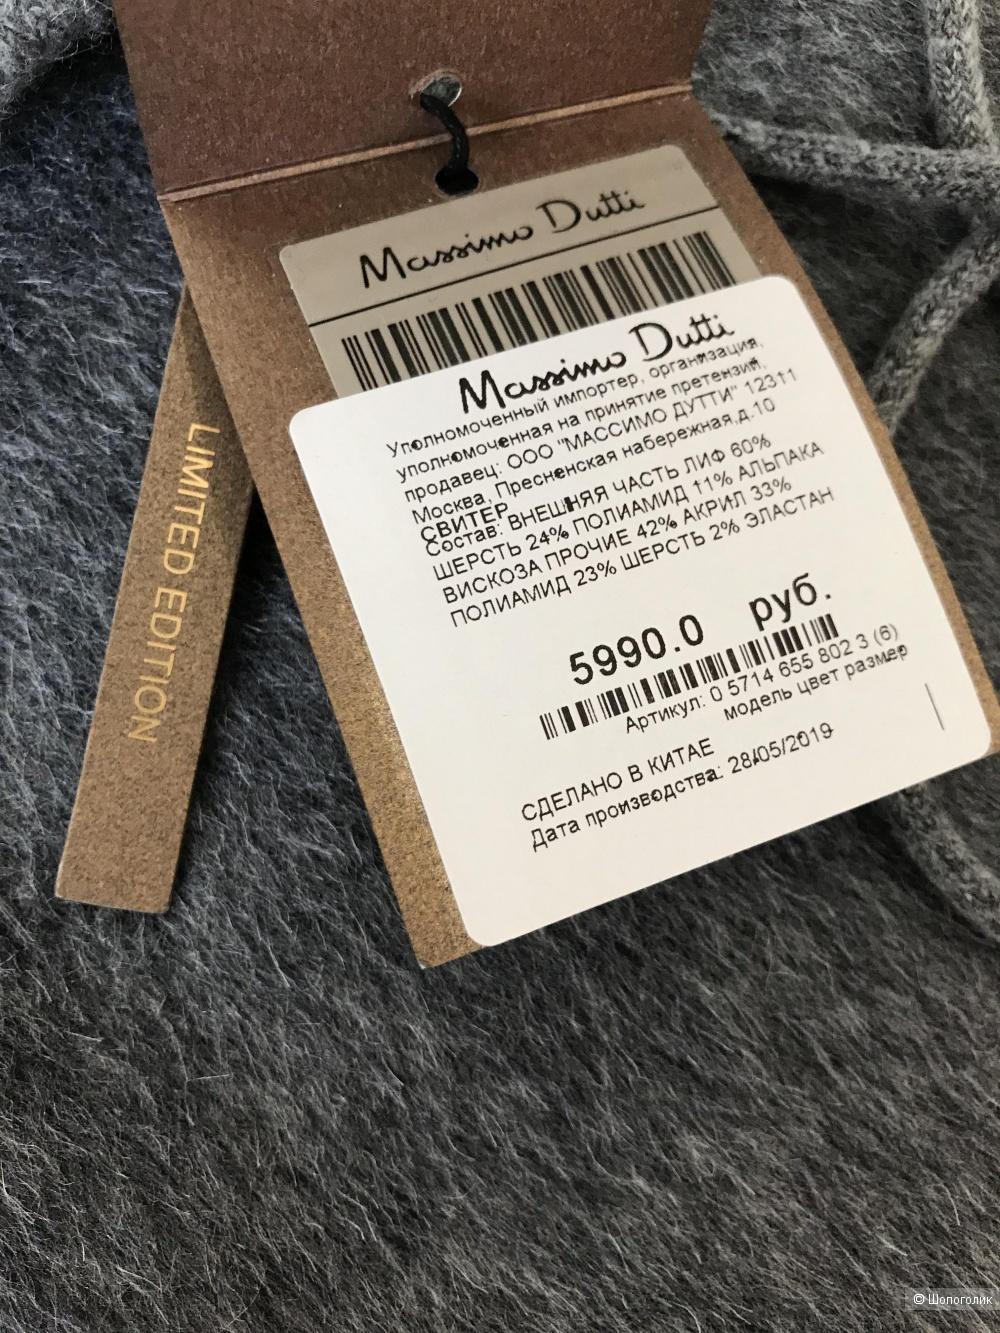 Шерстяной кейп с капюшоном Massimo Dutty коллекция размер M